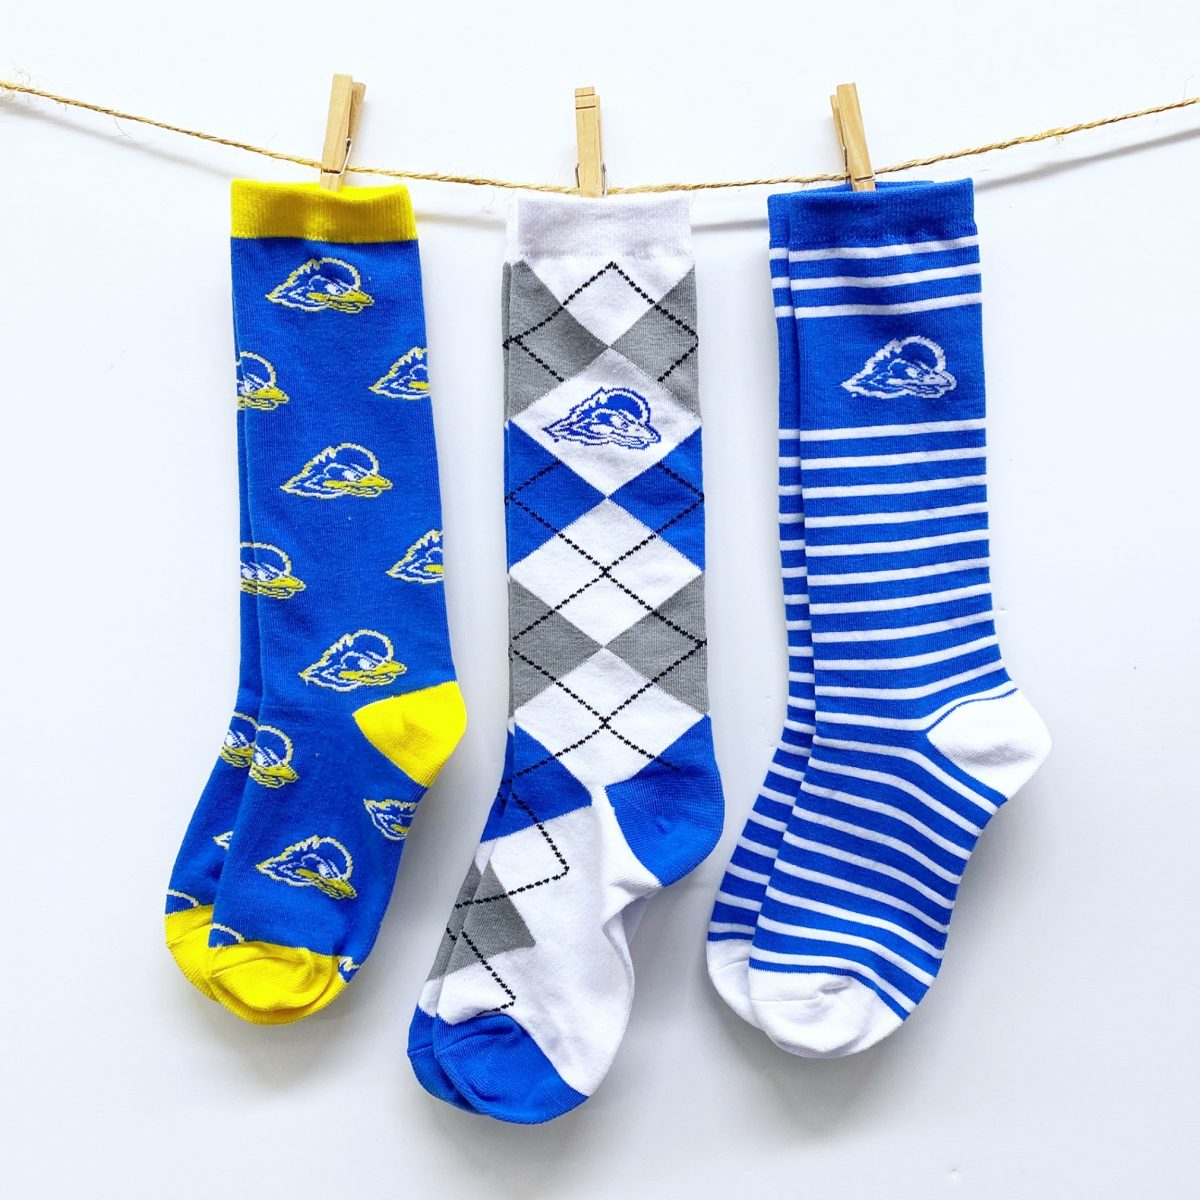 University of Delaware Fashion Socks